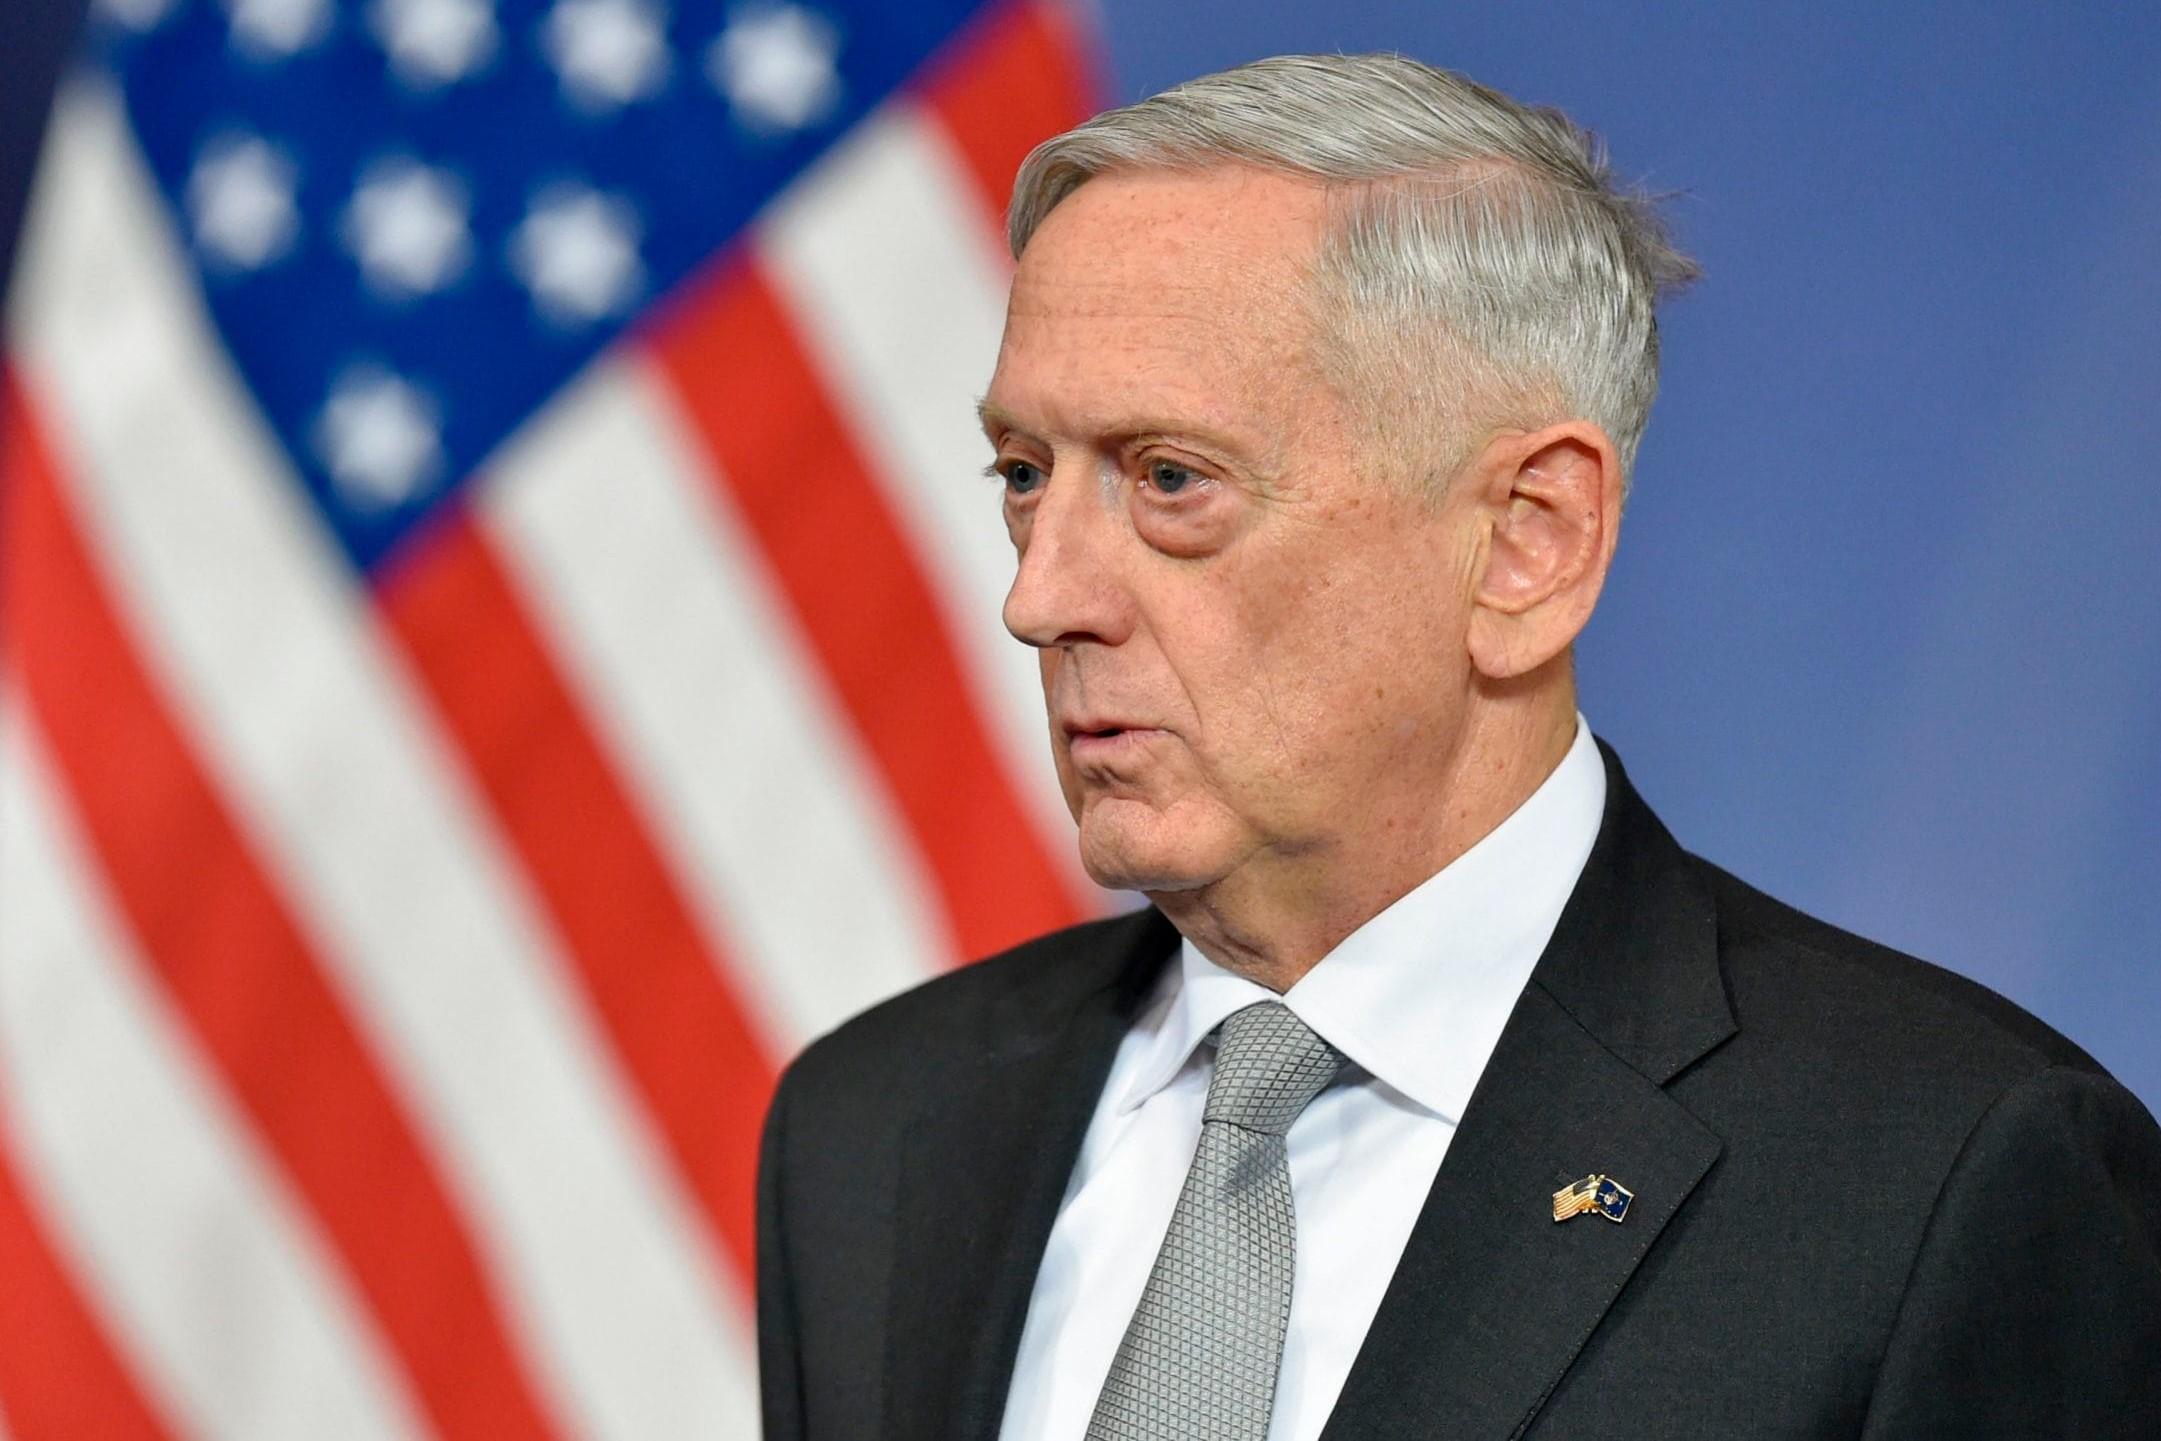 Will James Mattis leave the post of Defense Secretary?